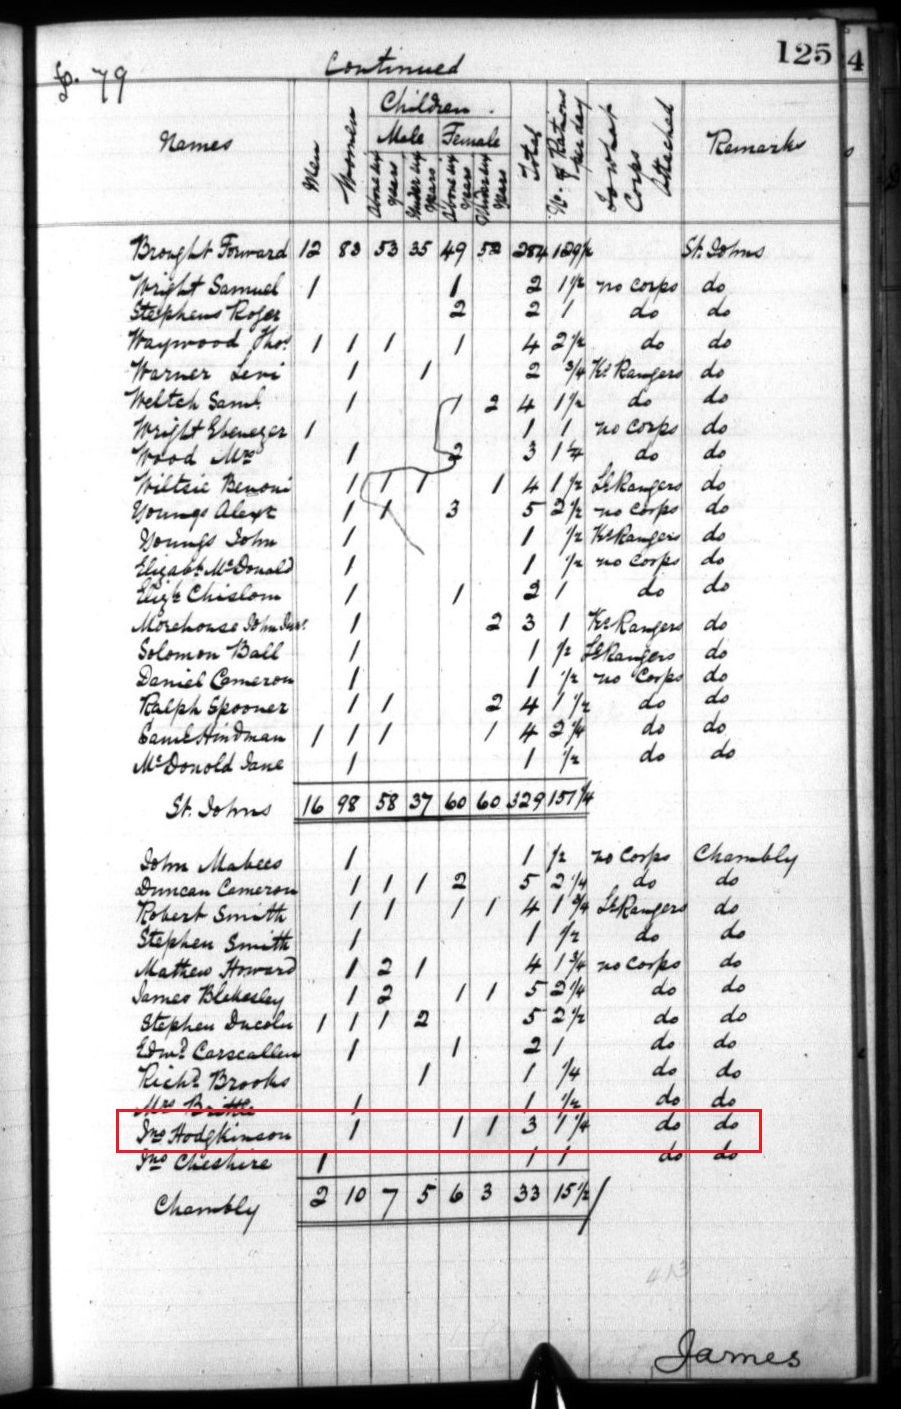 John Hodgkinson in Haldimand Papers p 125